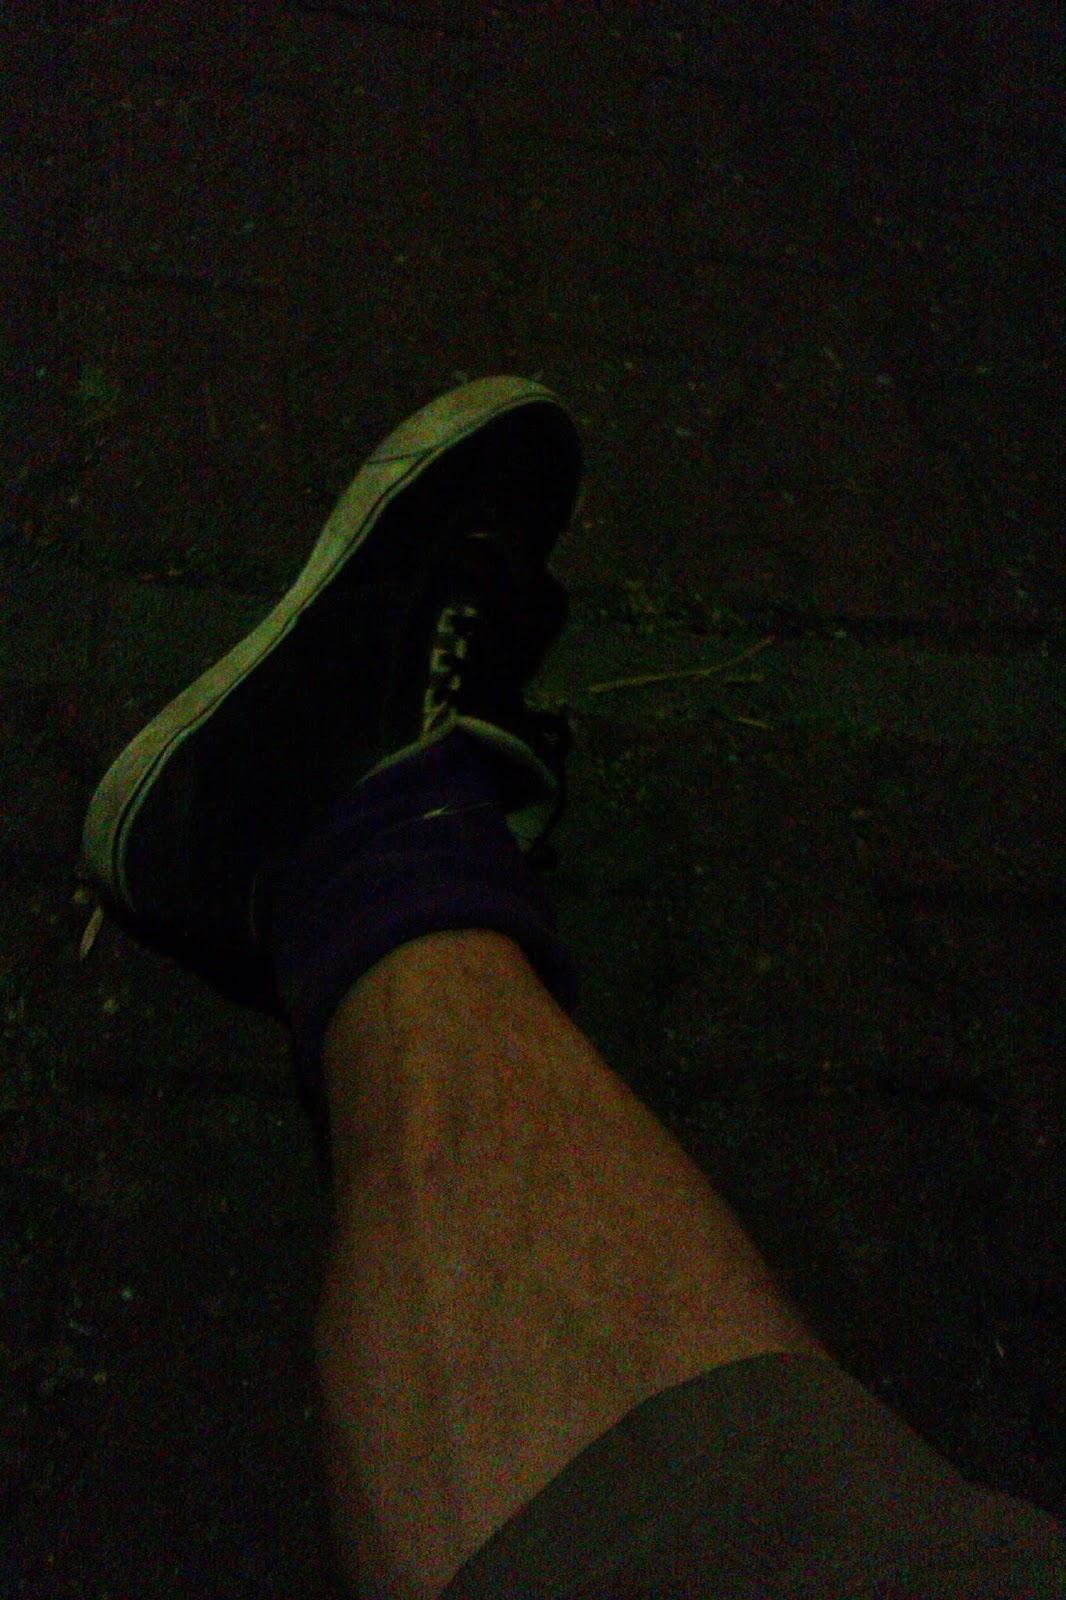 Foot leg photo